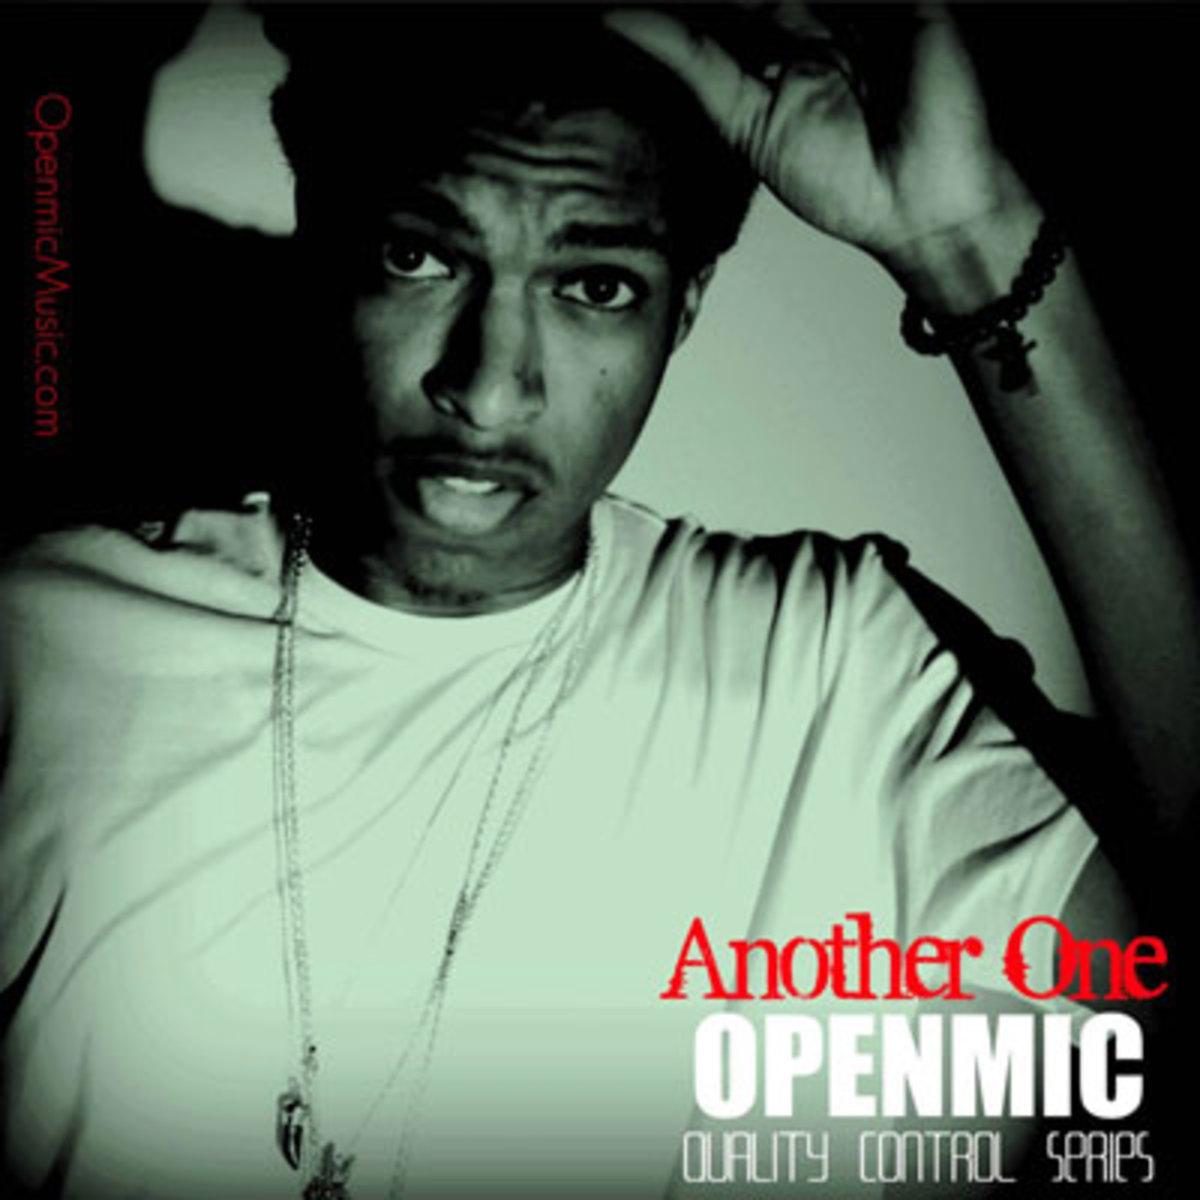 openmic-anotherone.jpg